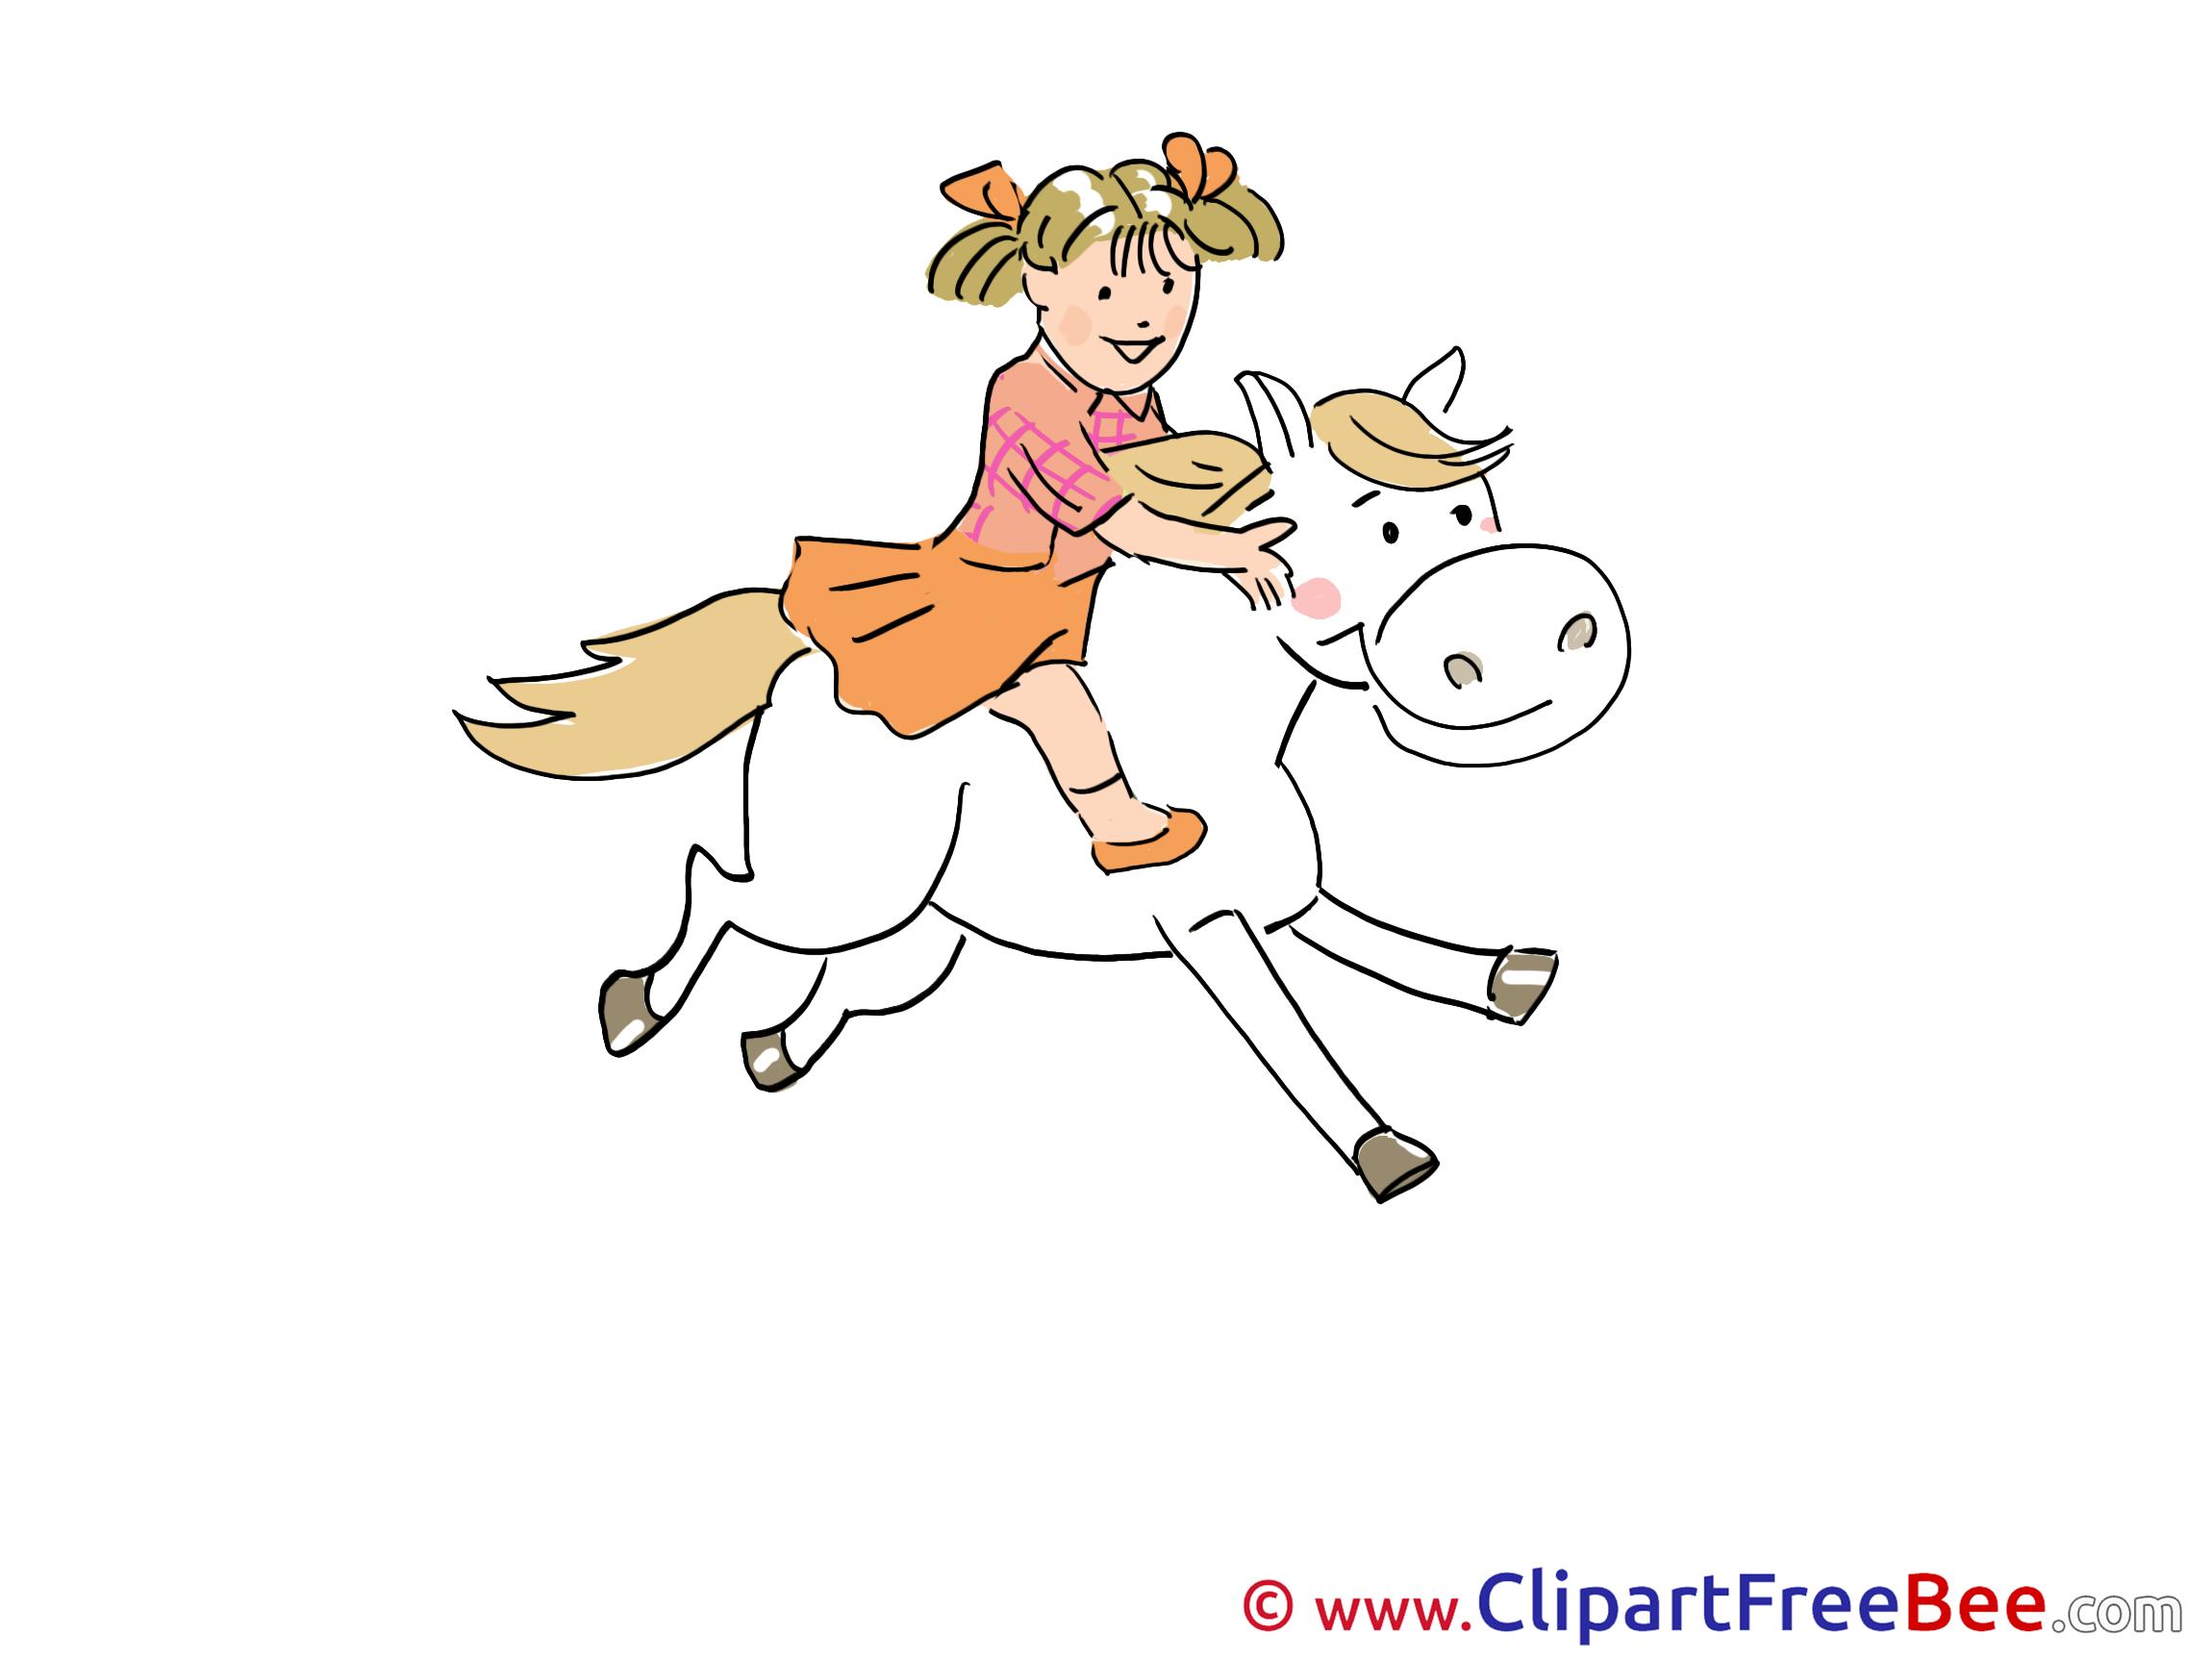 Rider Horse Pics printable Cliparts